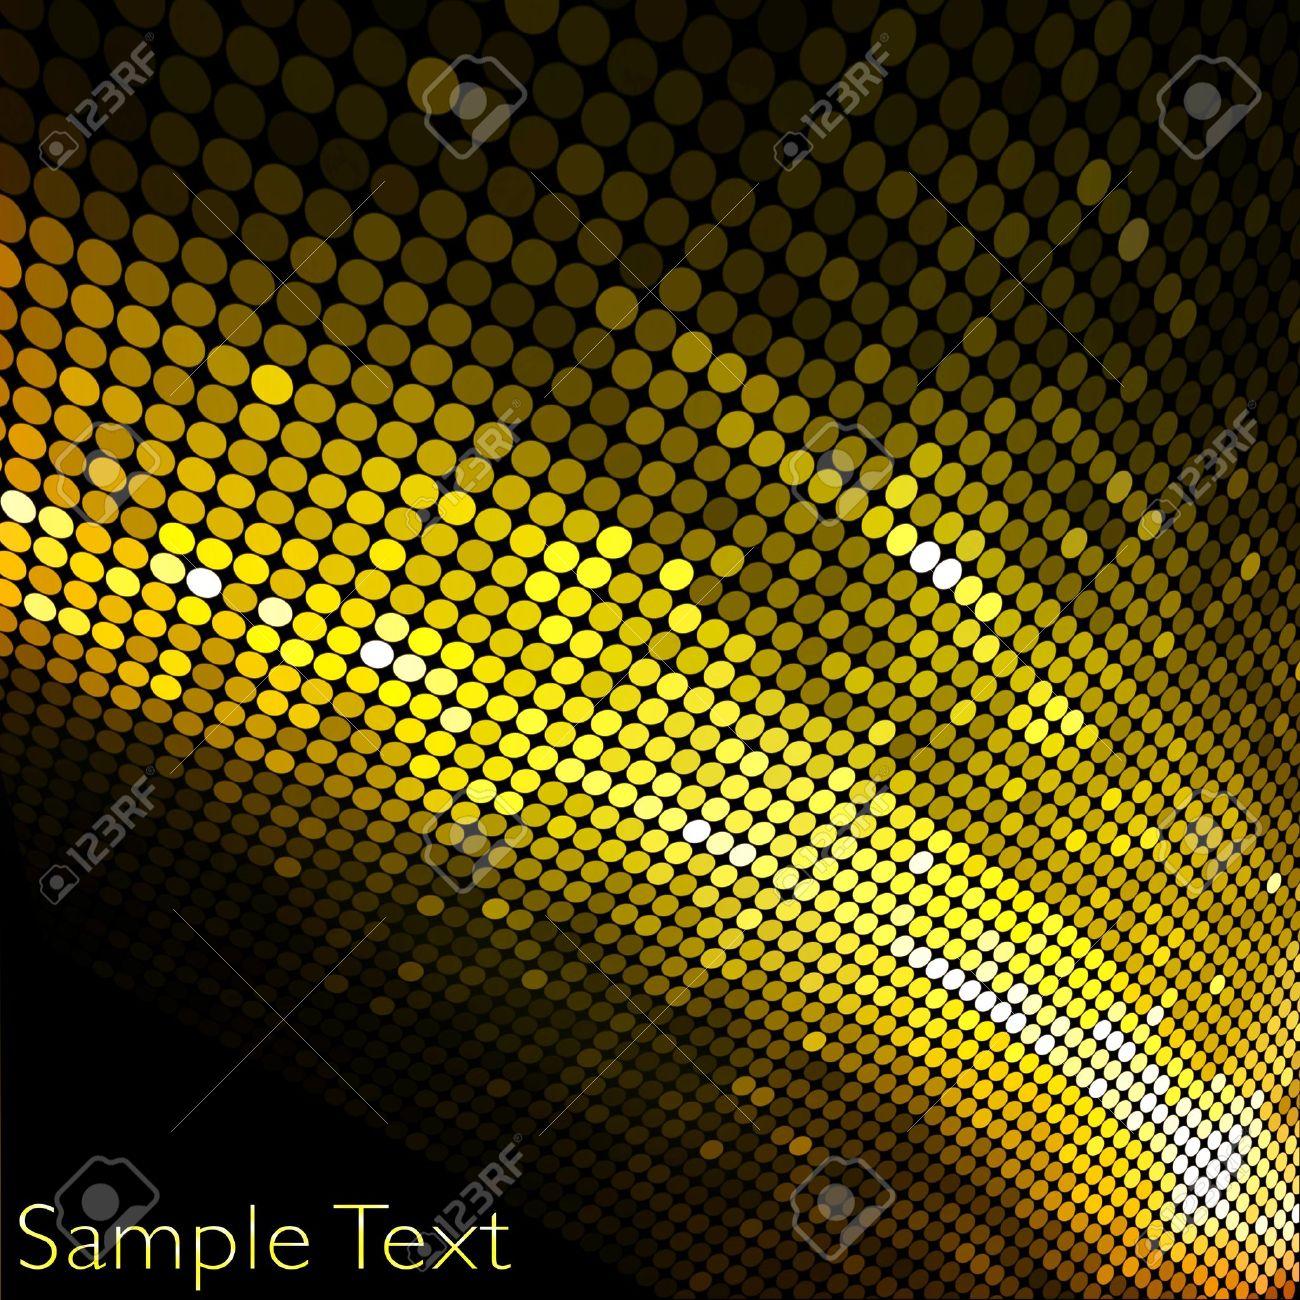 Golden business mosaic.Creative background. Stock Photo - 10720721